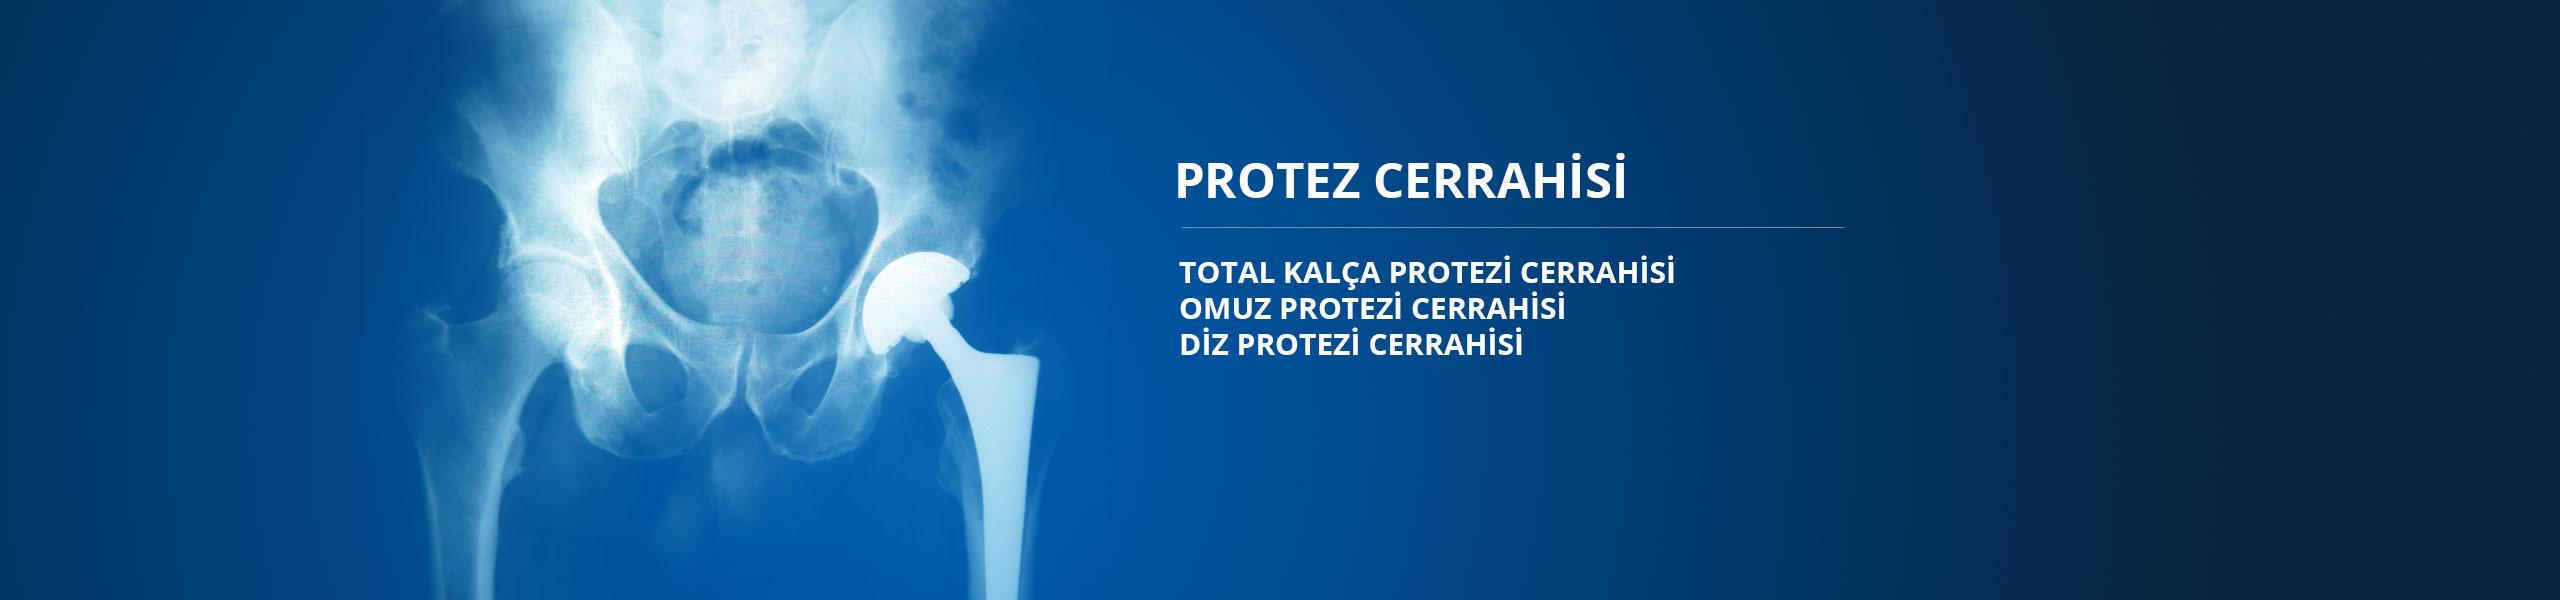 Protez Cerrahisi - Prof. Dr. Şenol Akman